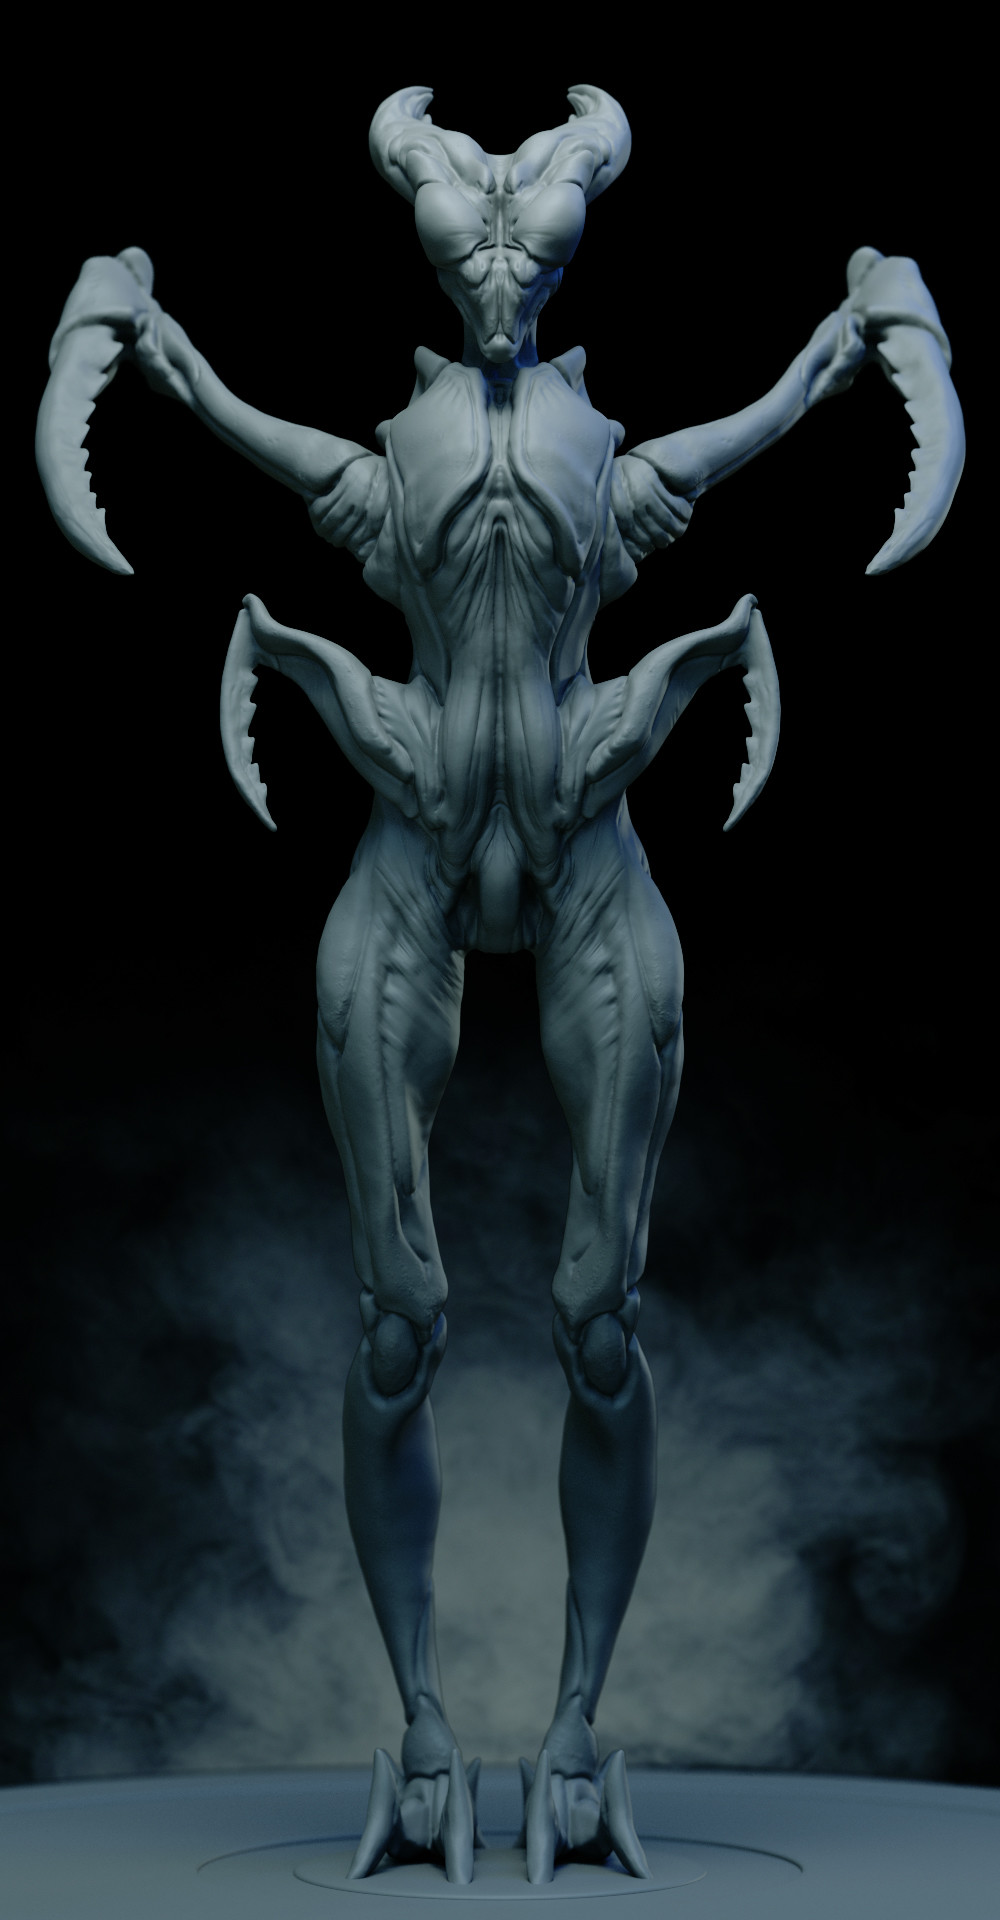 Ilhan yilmaz insectoid render sheet v06